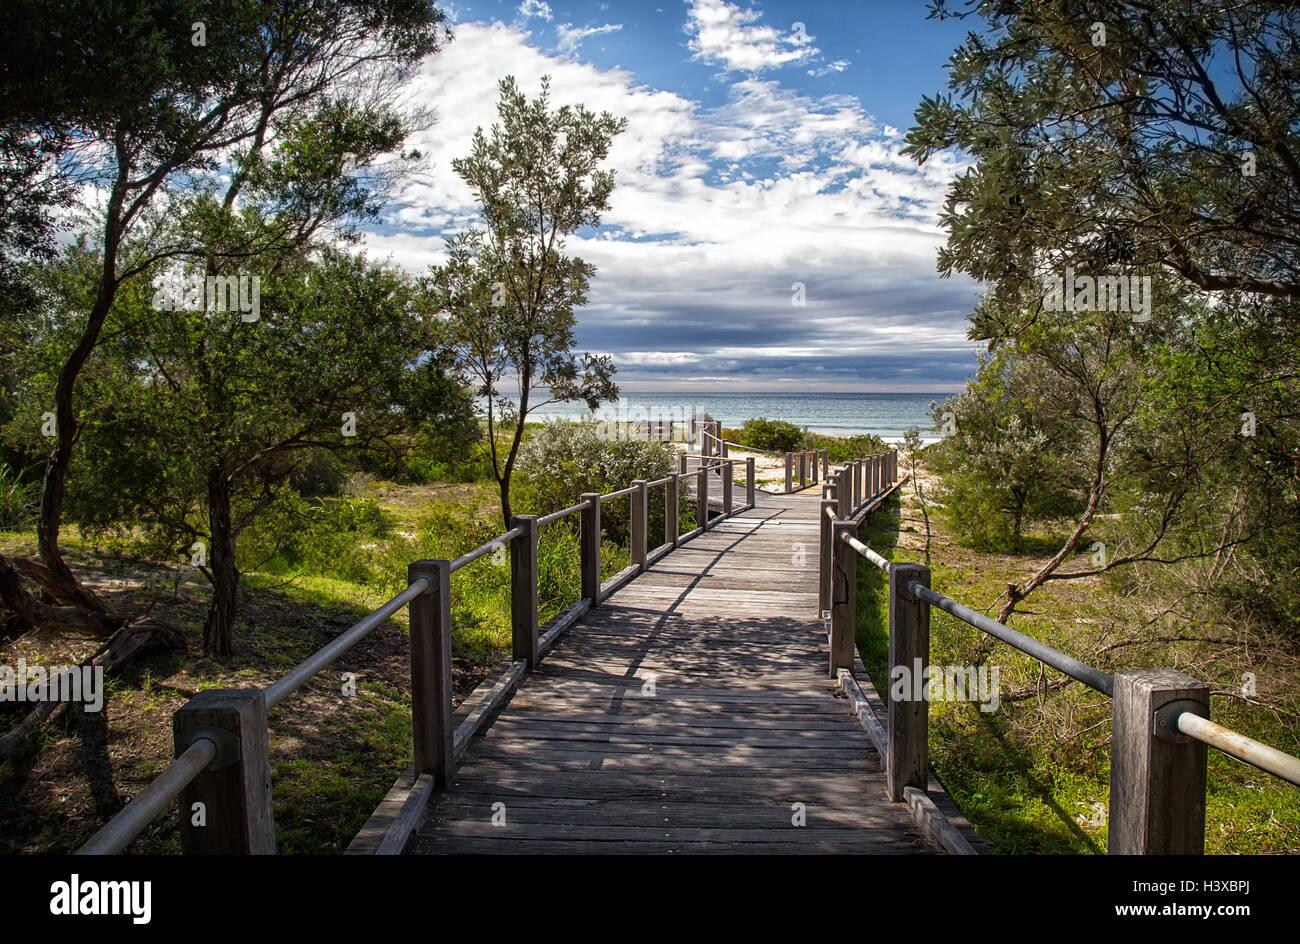 A wooden boardwalk leading to 7 Mile Beach near Gerroa in Australia - Stock Image